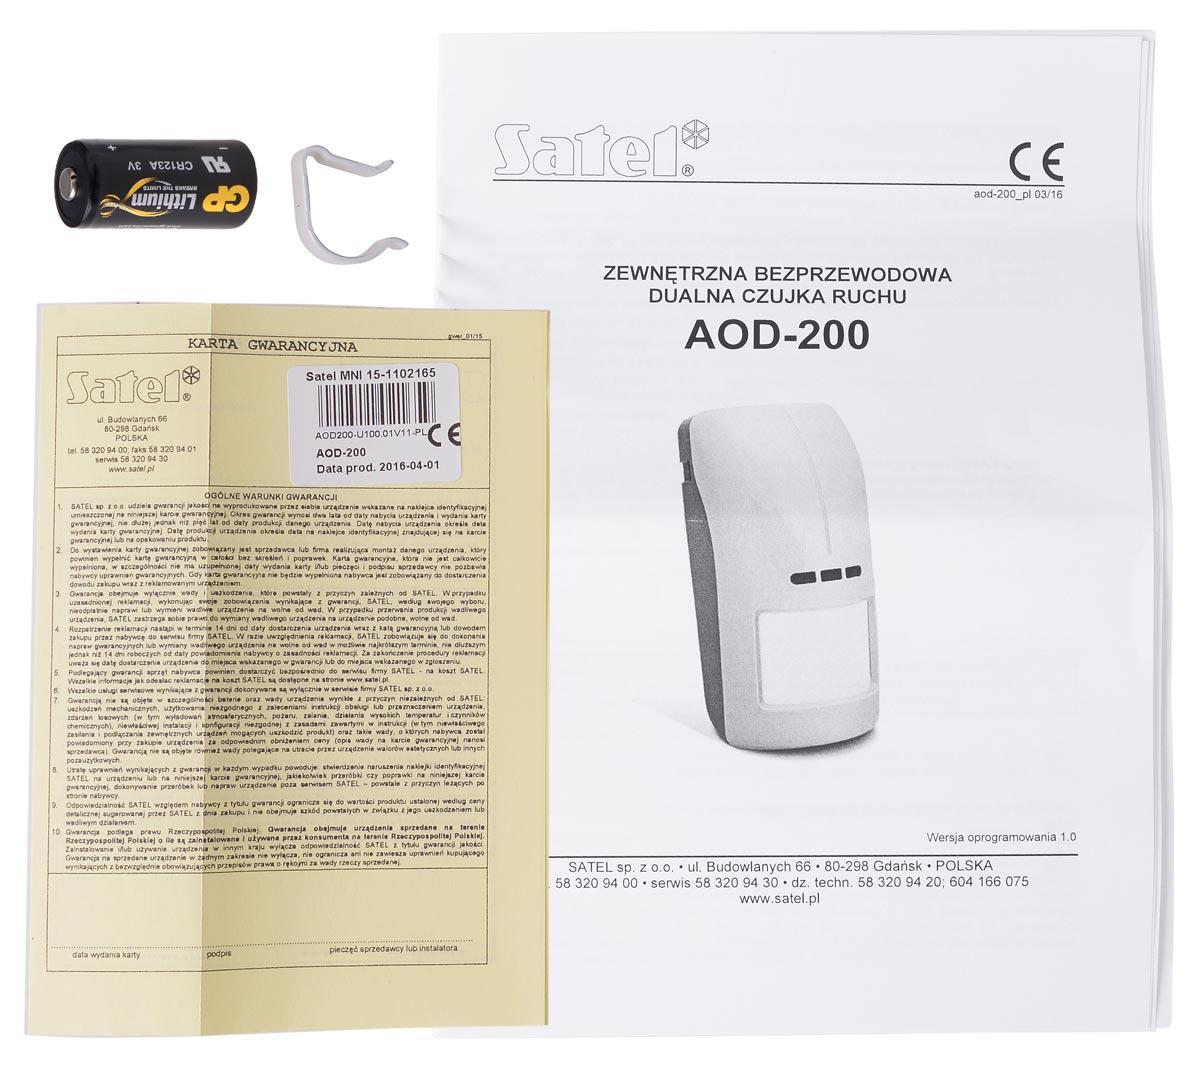 Akcesoria czujki ruchu AOD-200 GY